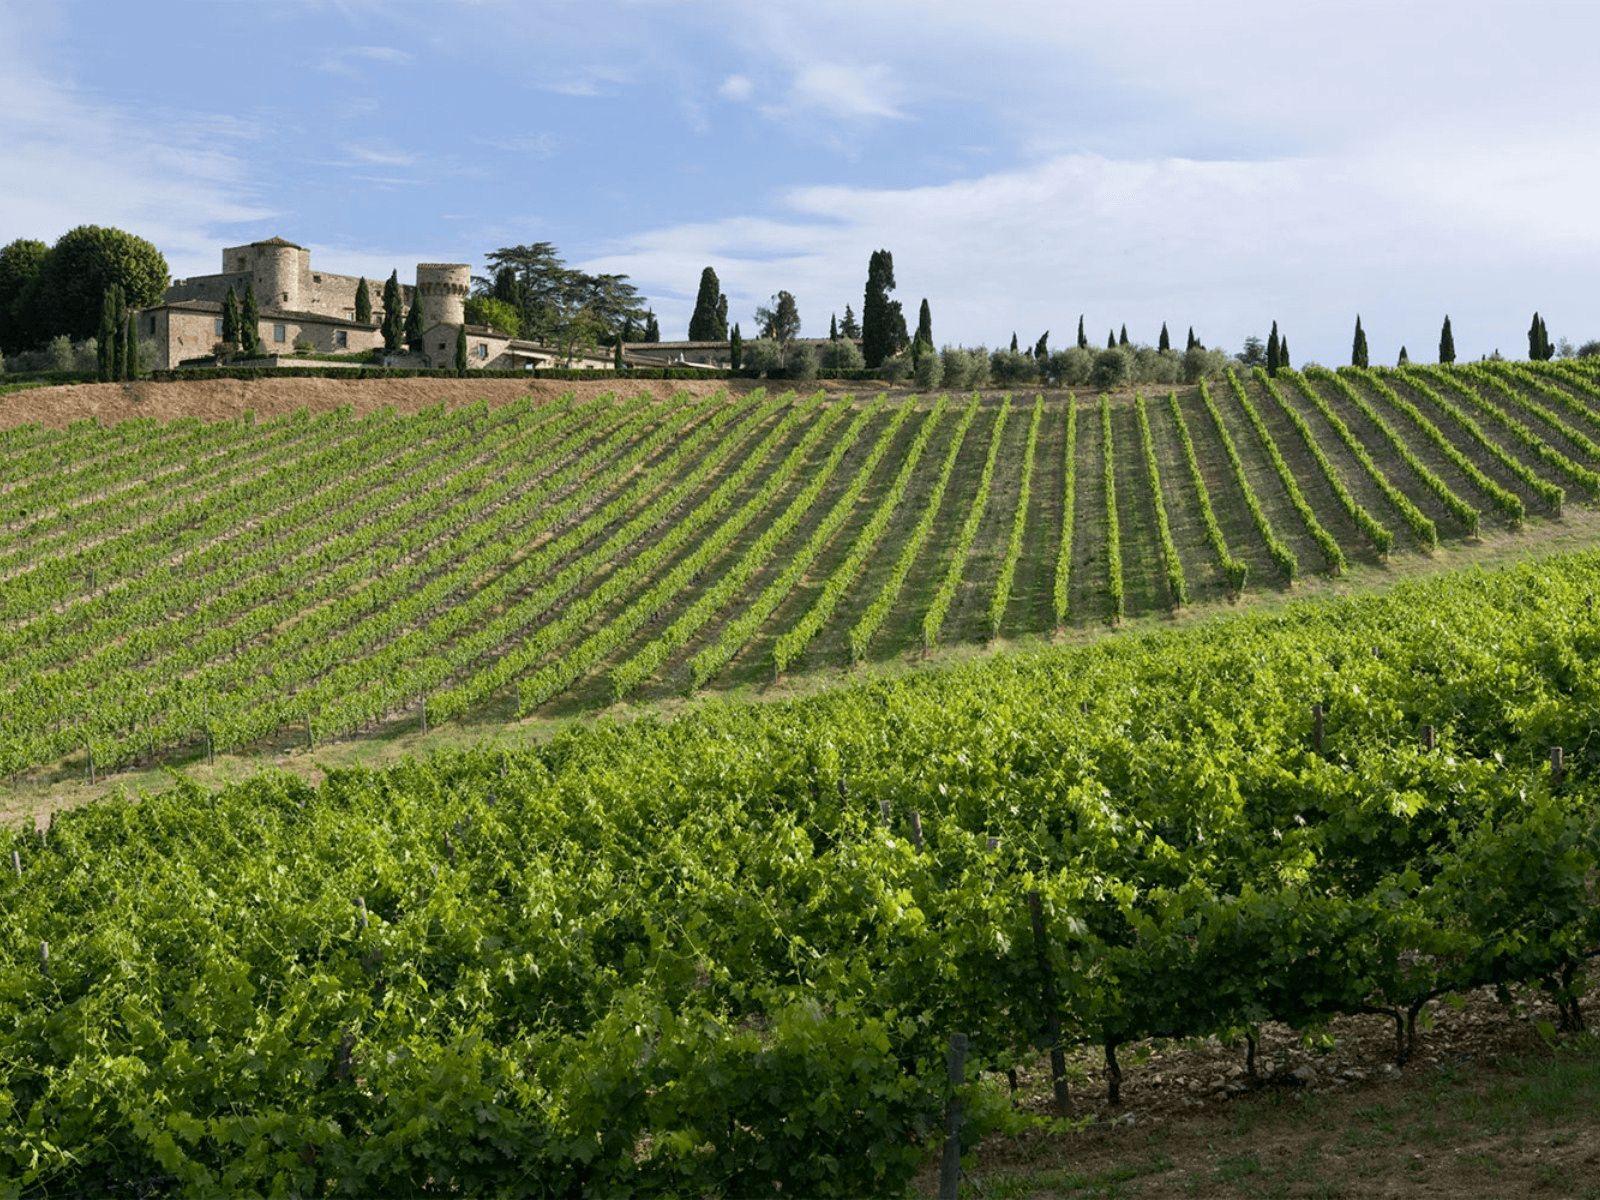 Toskana i Firenca: Toskana: vinogradi, maslenici i dvorci